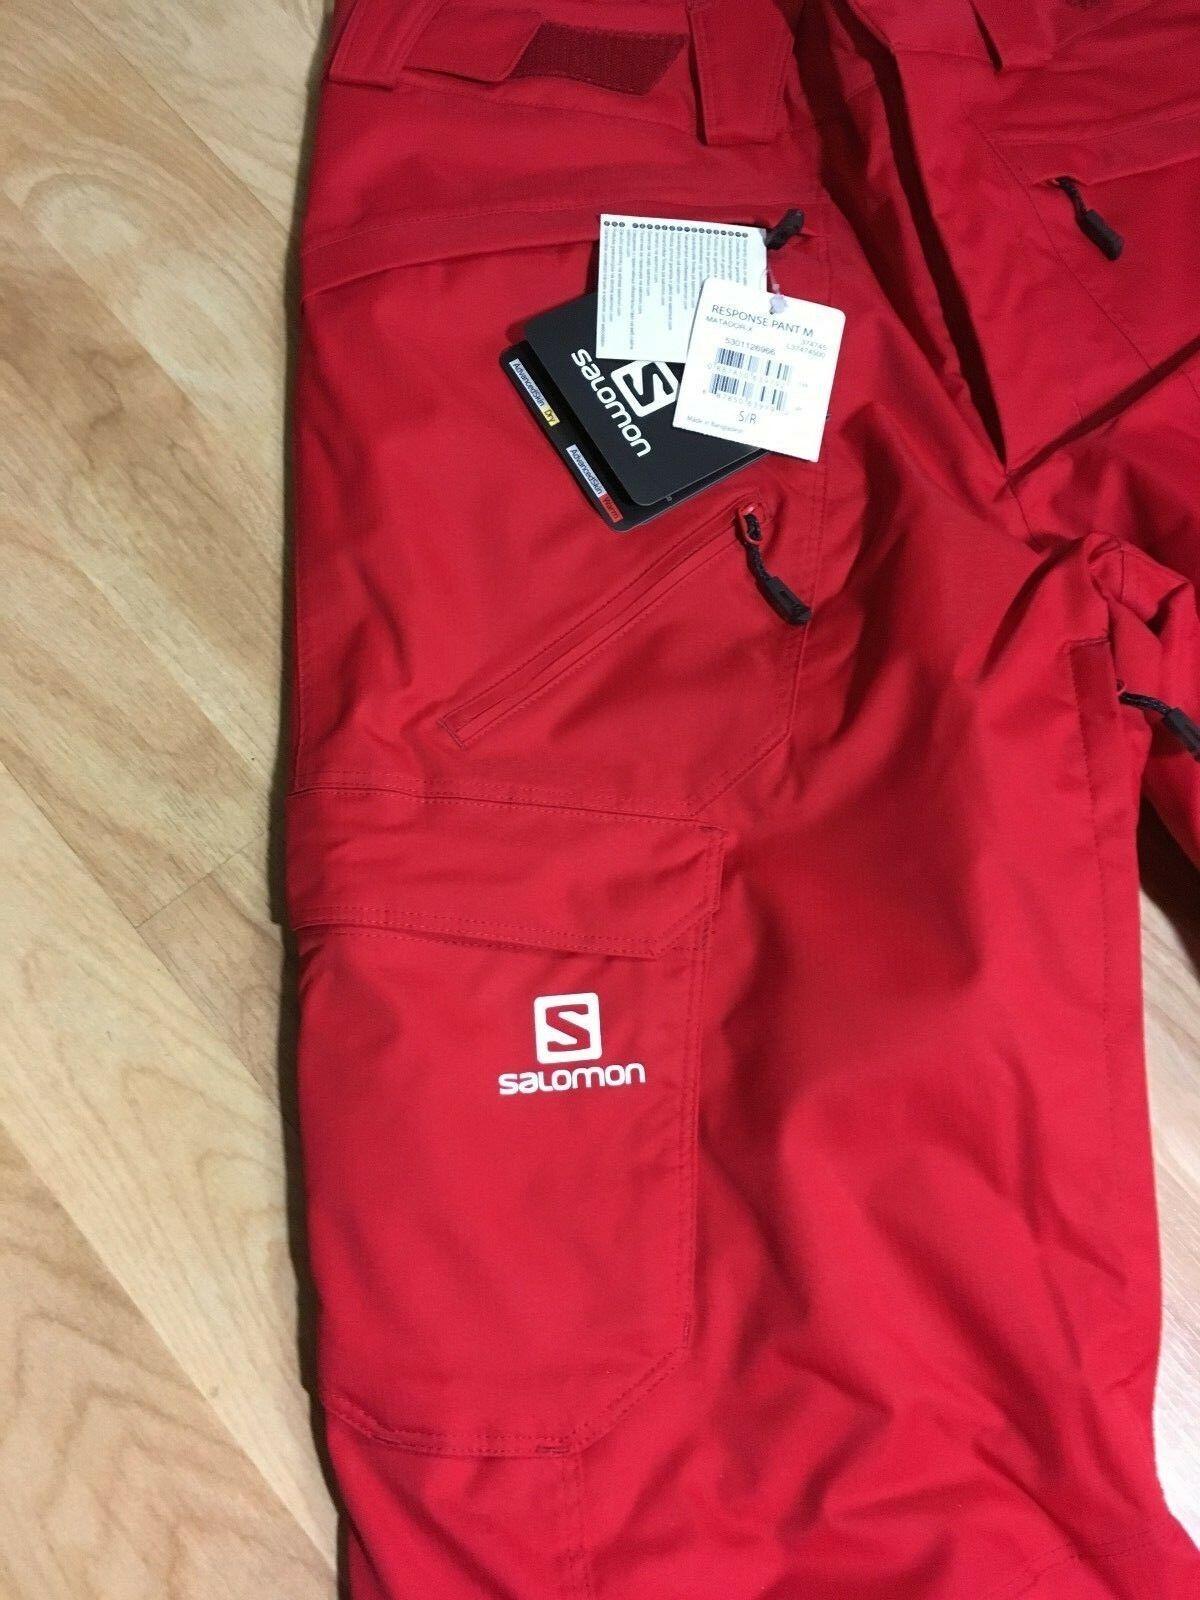 Salomon Response Ski Snowboard Pants Unisex, Size XS or S, Red, NEW image 4